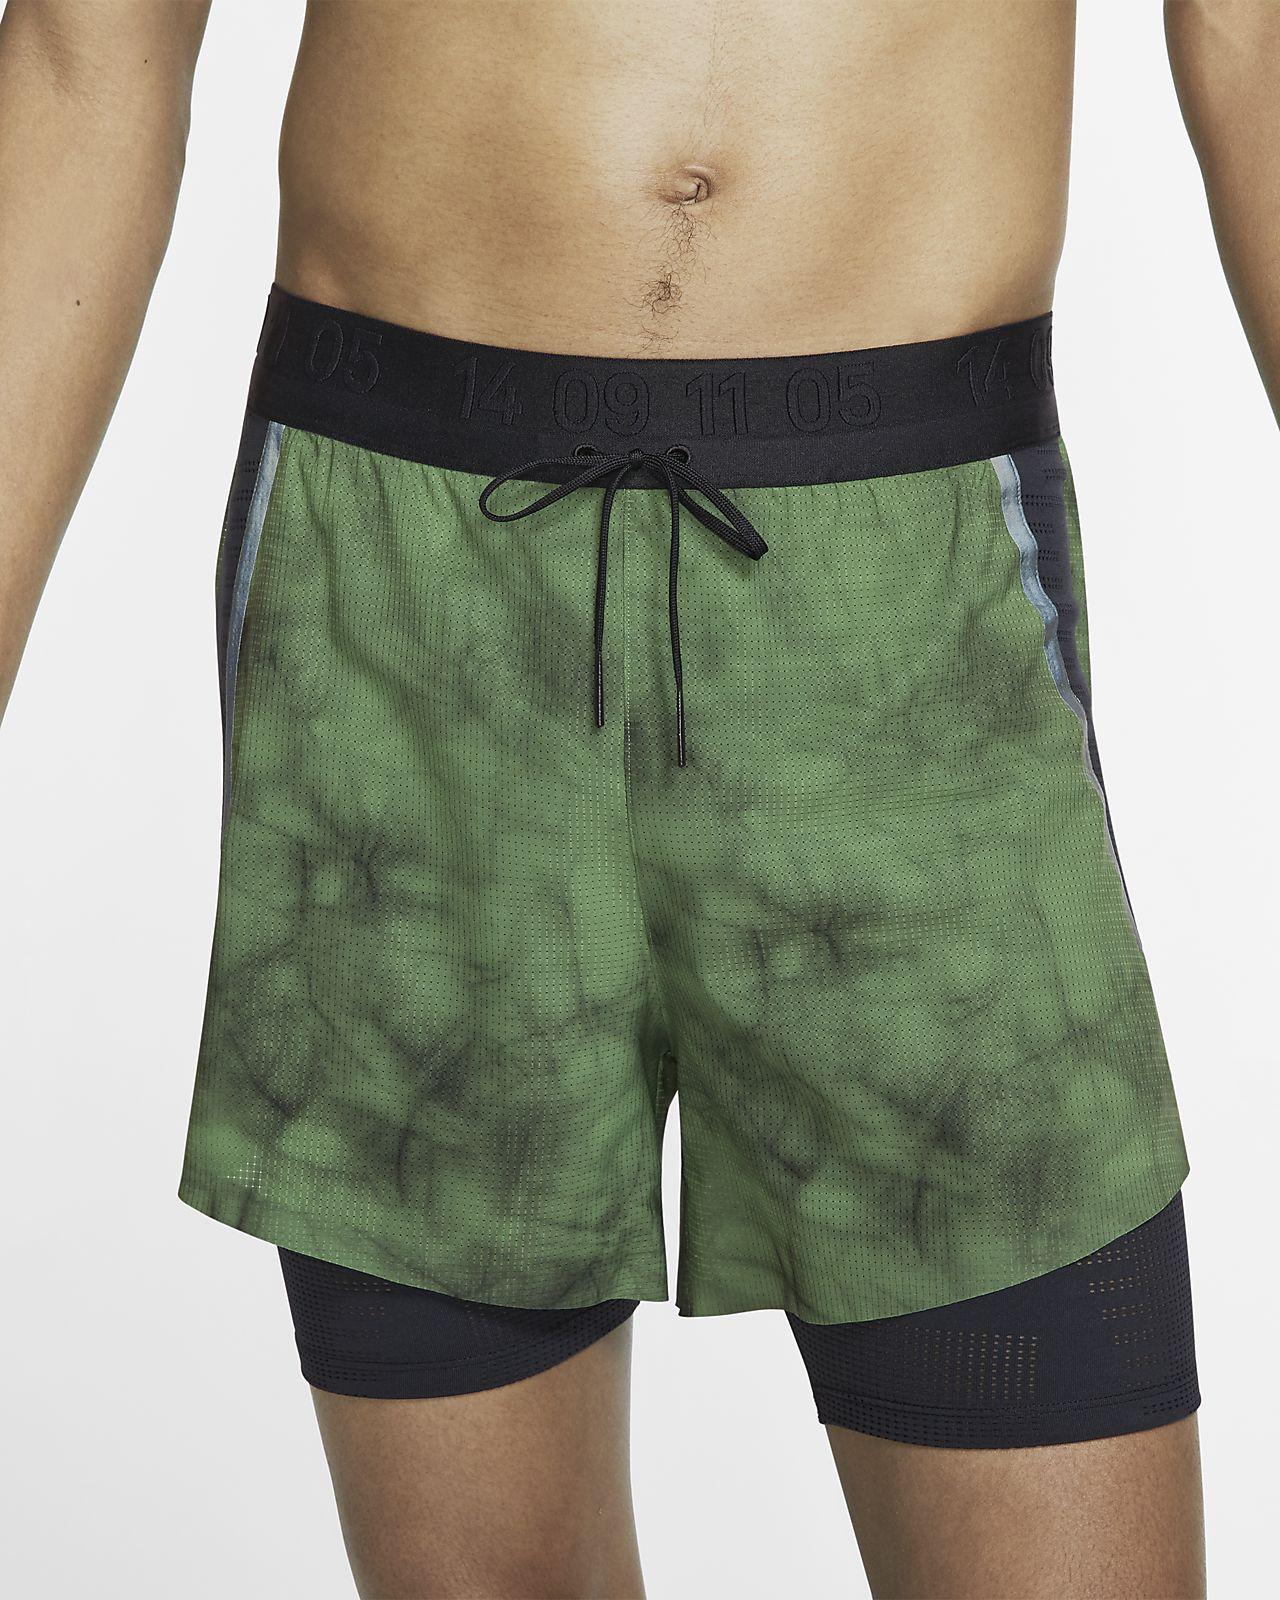 Short de running 2-en-1 Nike Tech Pack pour Homme